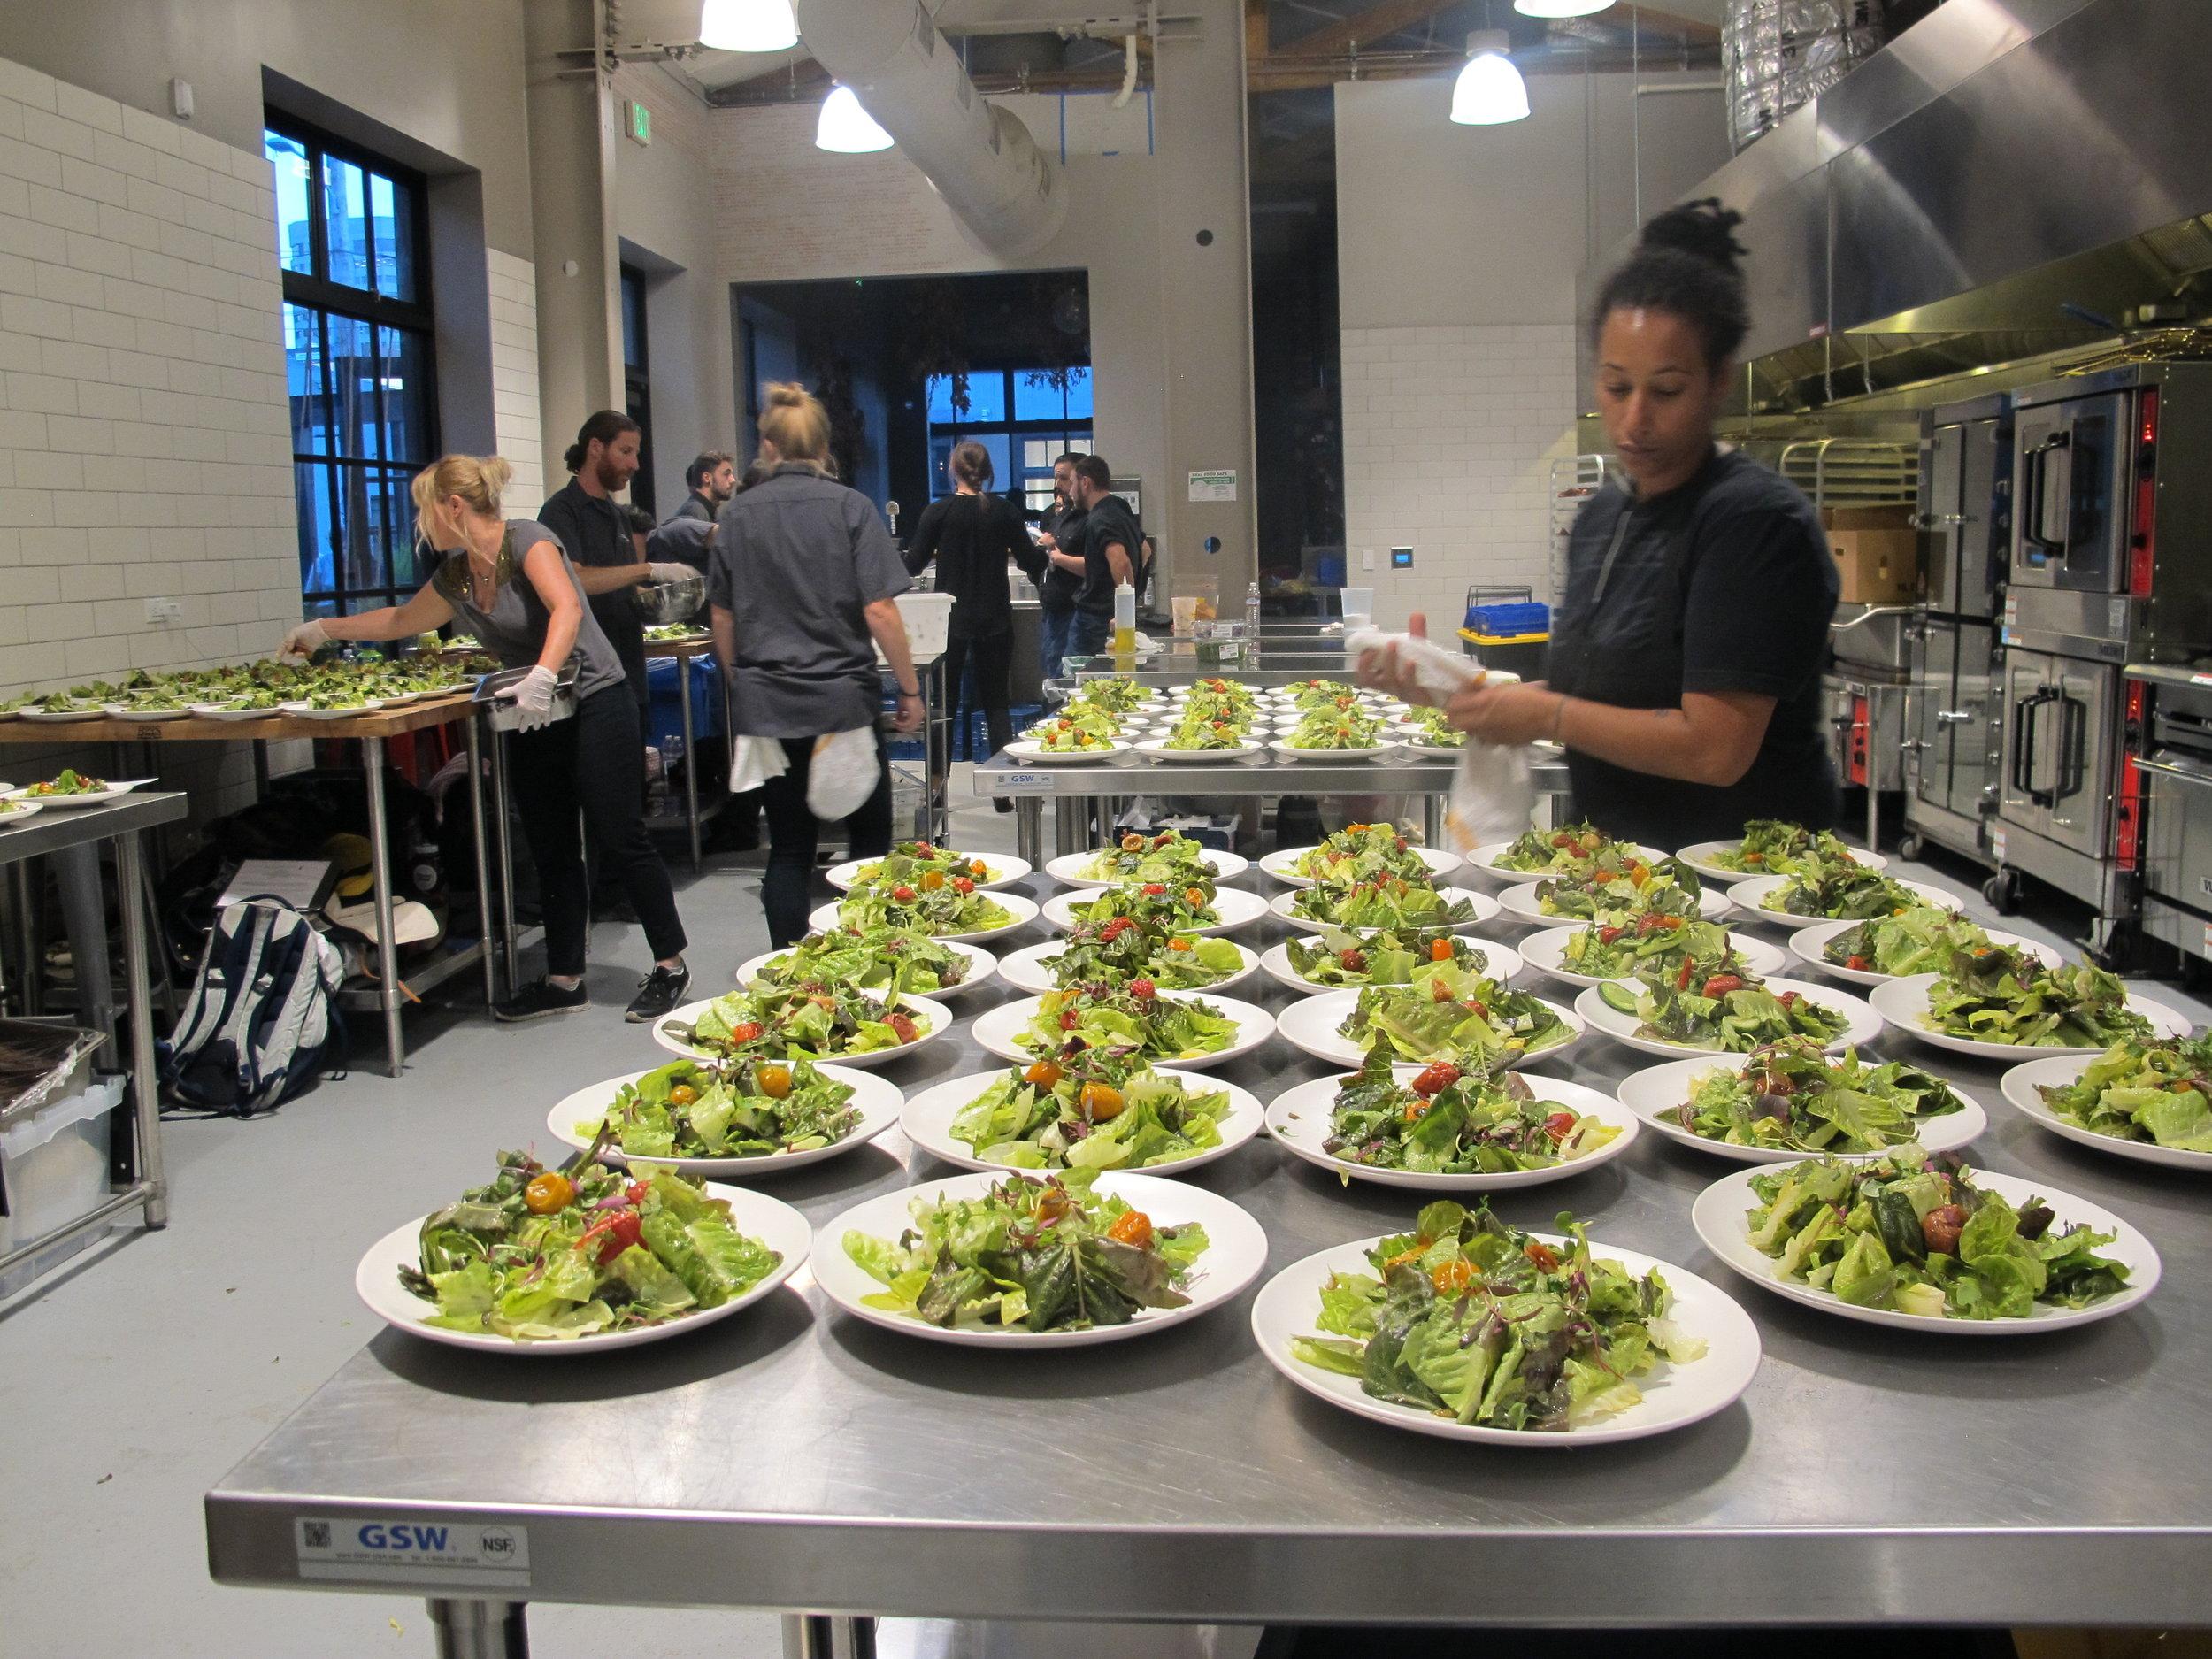 Facilities Forage Kitchen Commissary Kitchen Shared